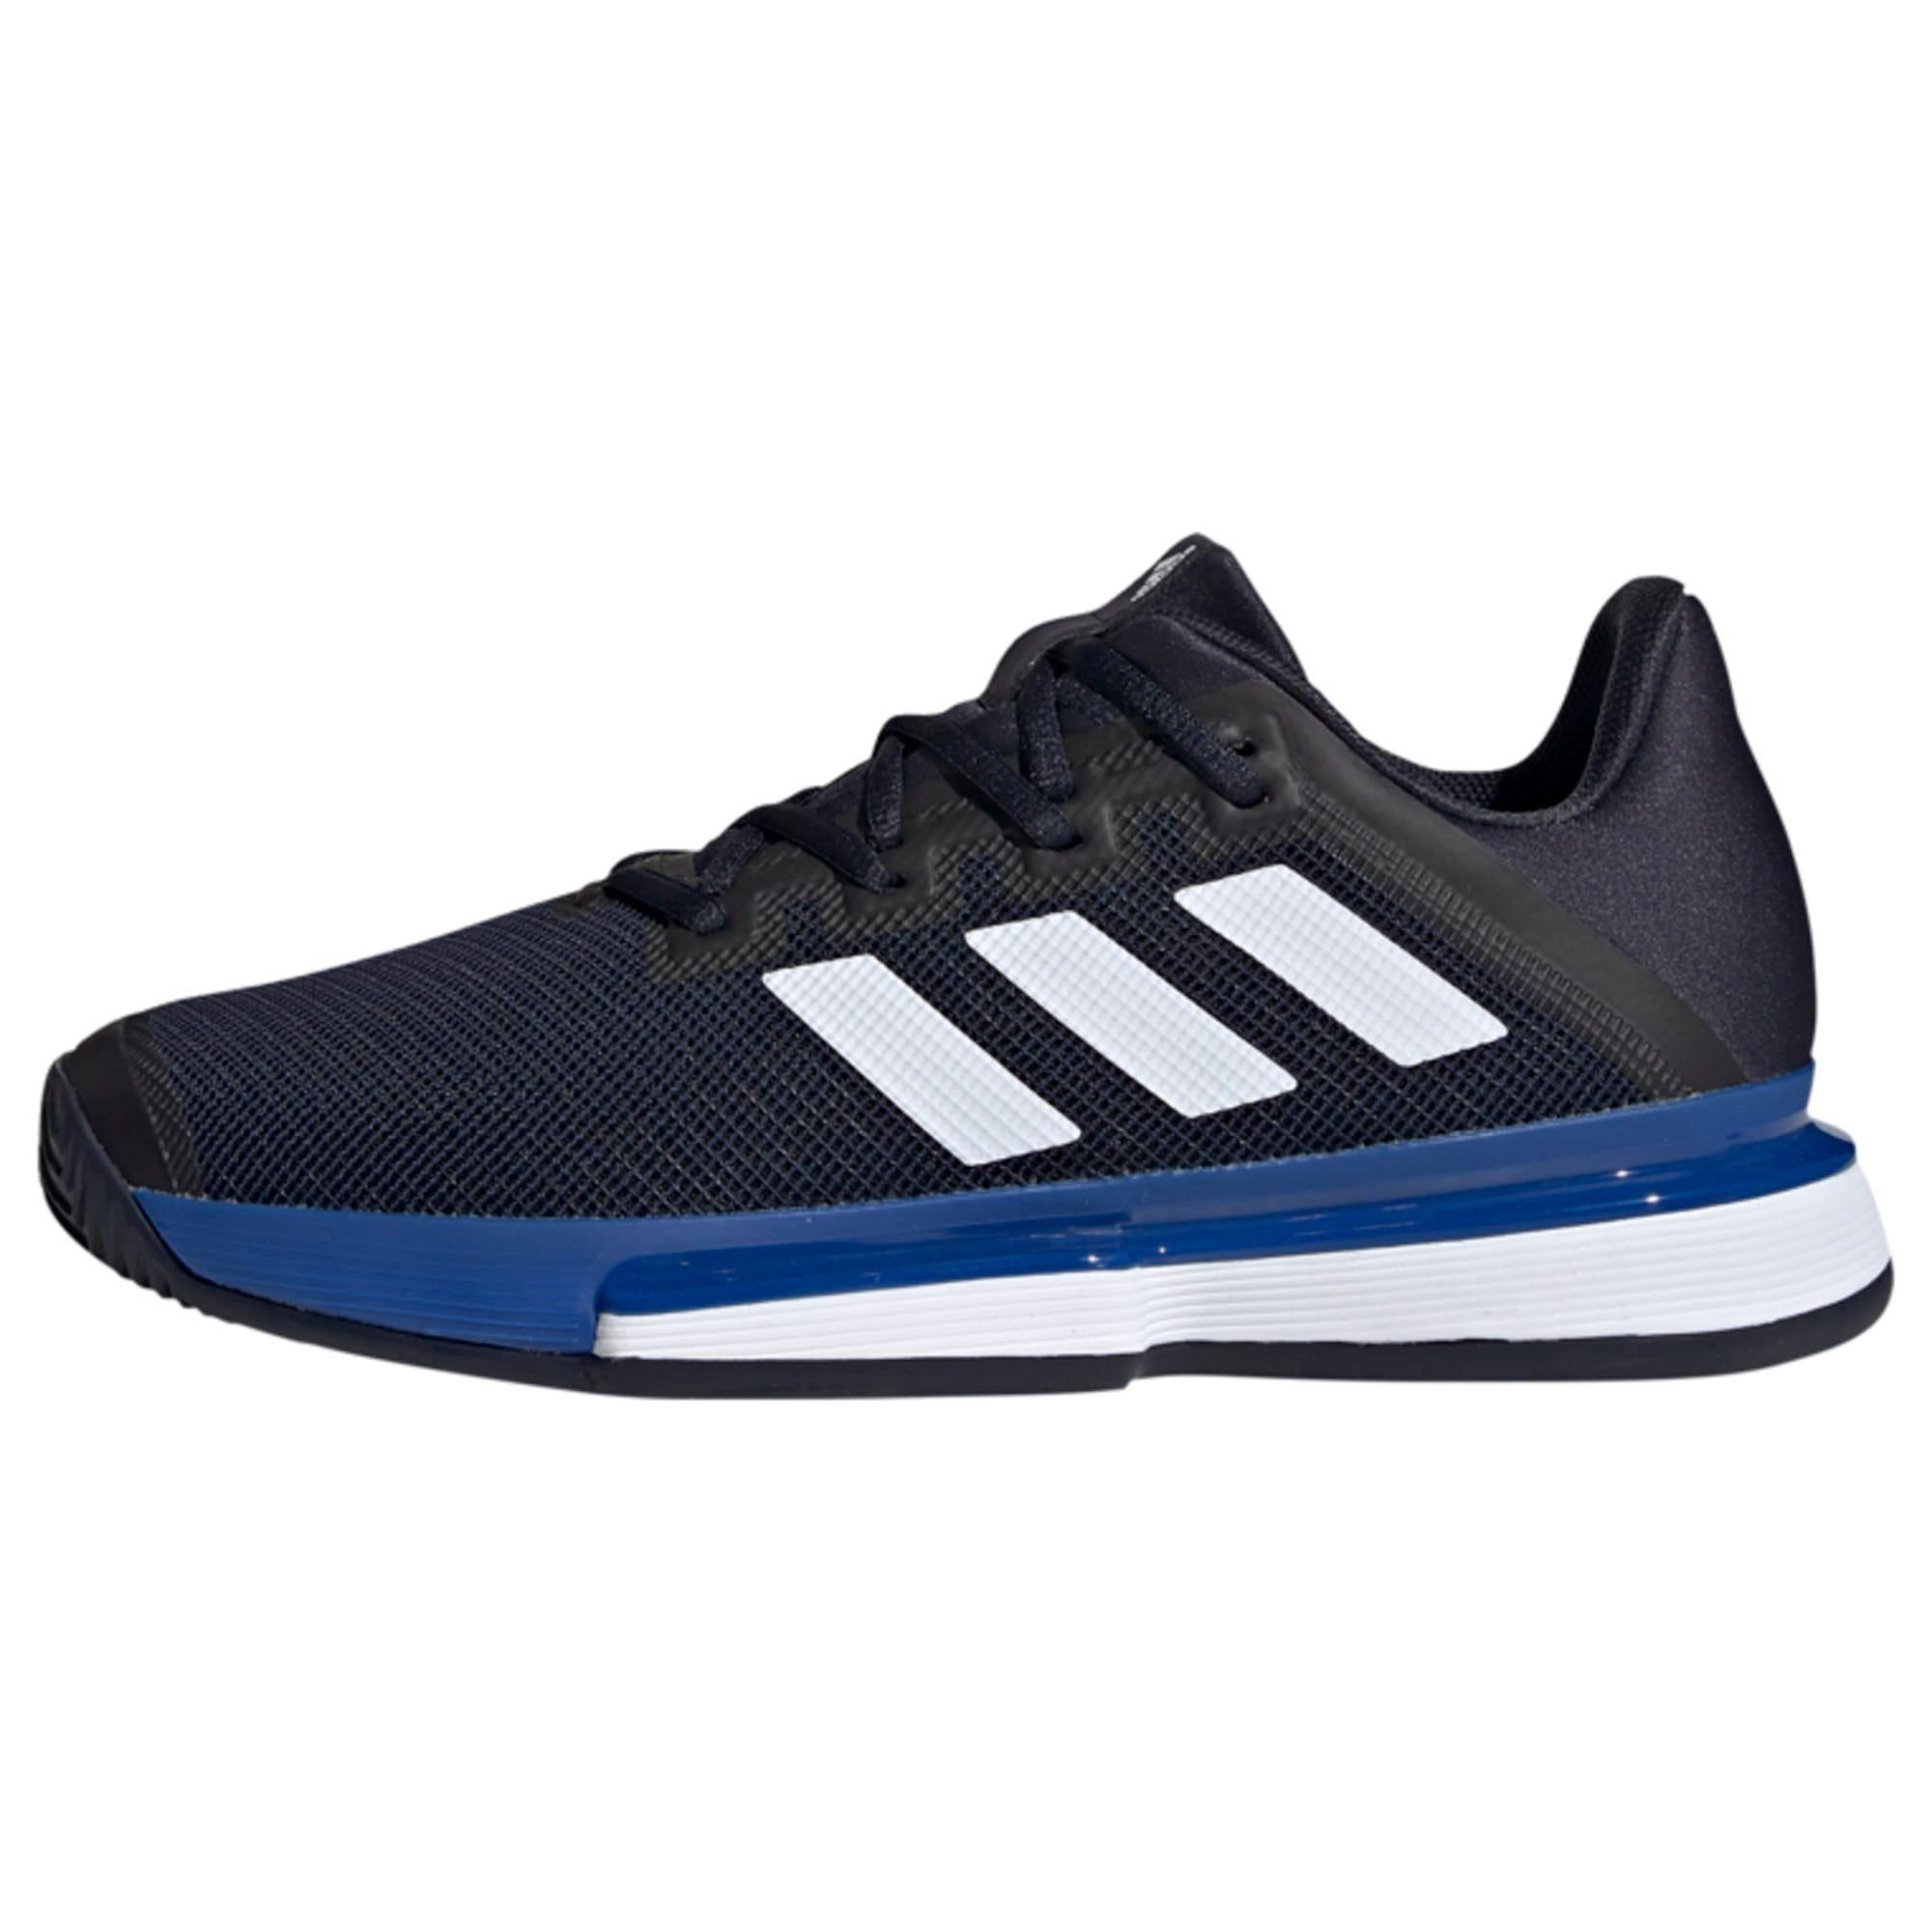 adidas Performance »SoleMatch Bounce Clay Court Schuh« Tennisschuh Barricade online kaufen | OTTO